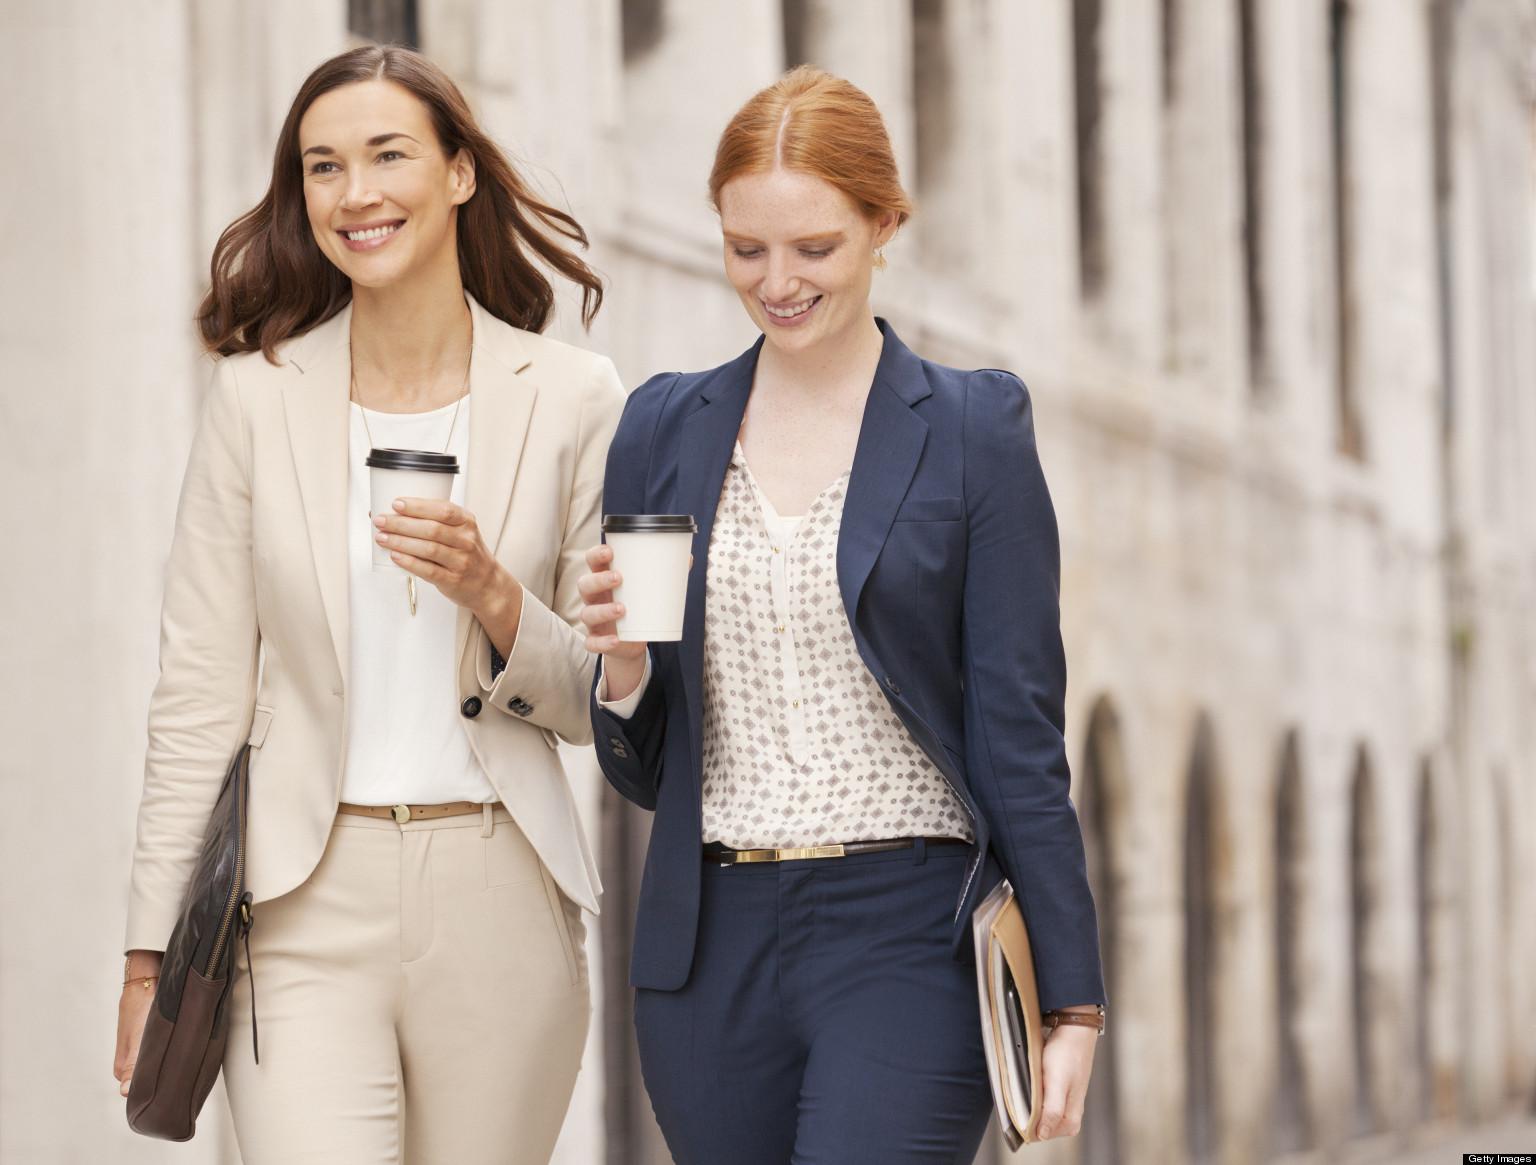 Smiling businesswomen walking with coffee